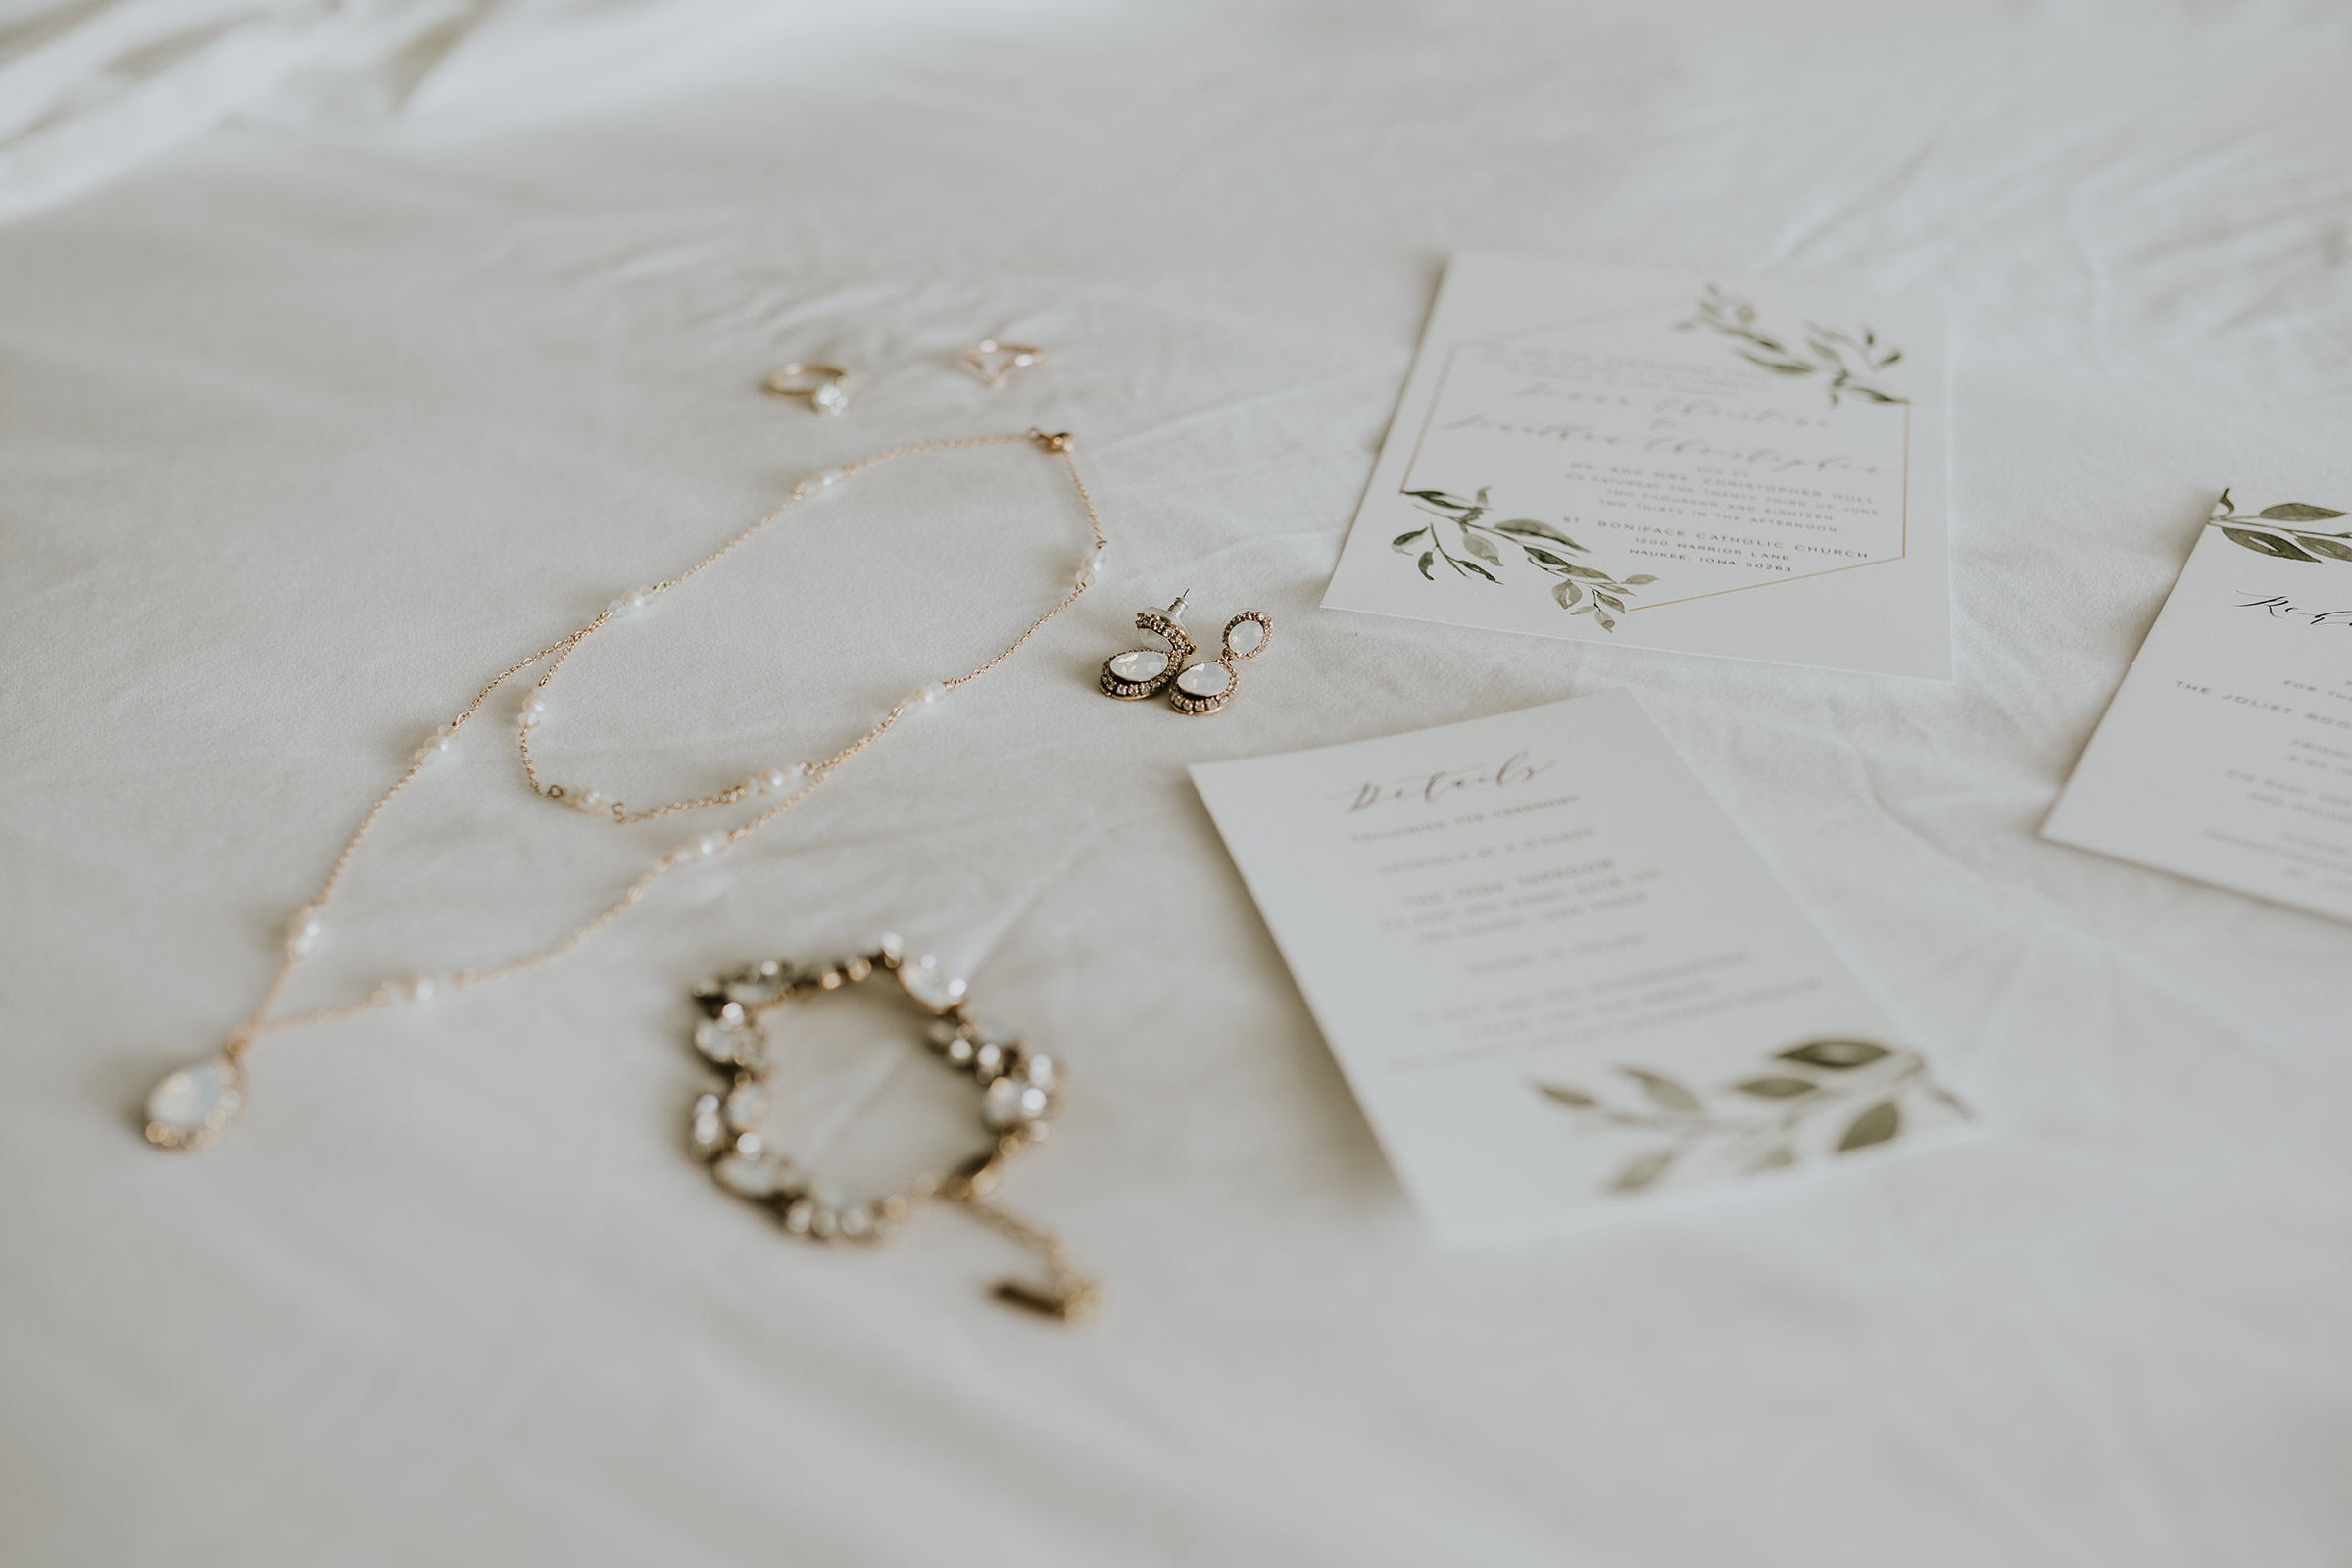 mr-mrs-hull-bridal-jewelry-desmoines-iowa-raelyn-ramey-photography-2.jpg